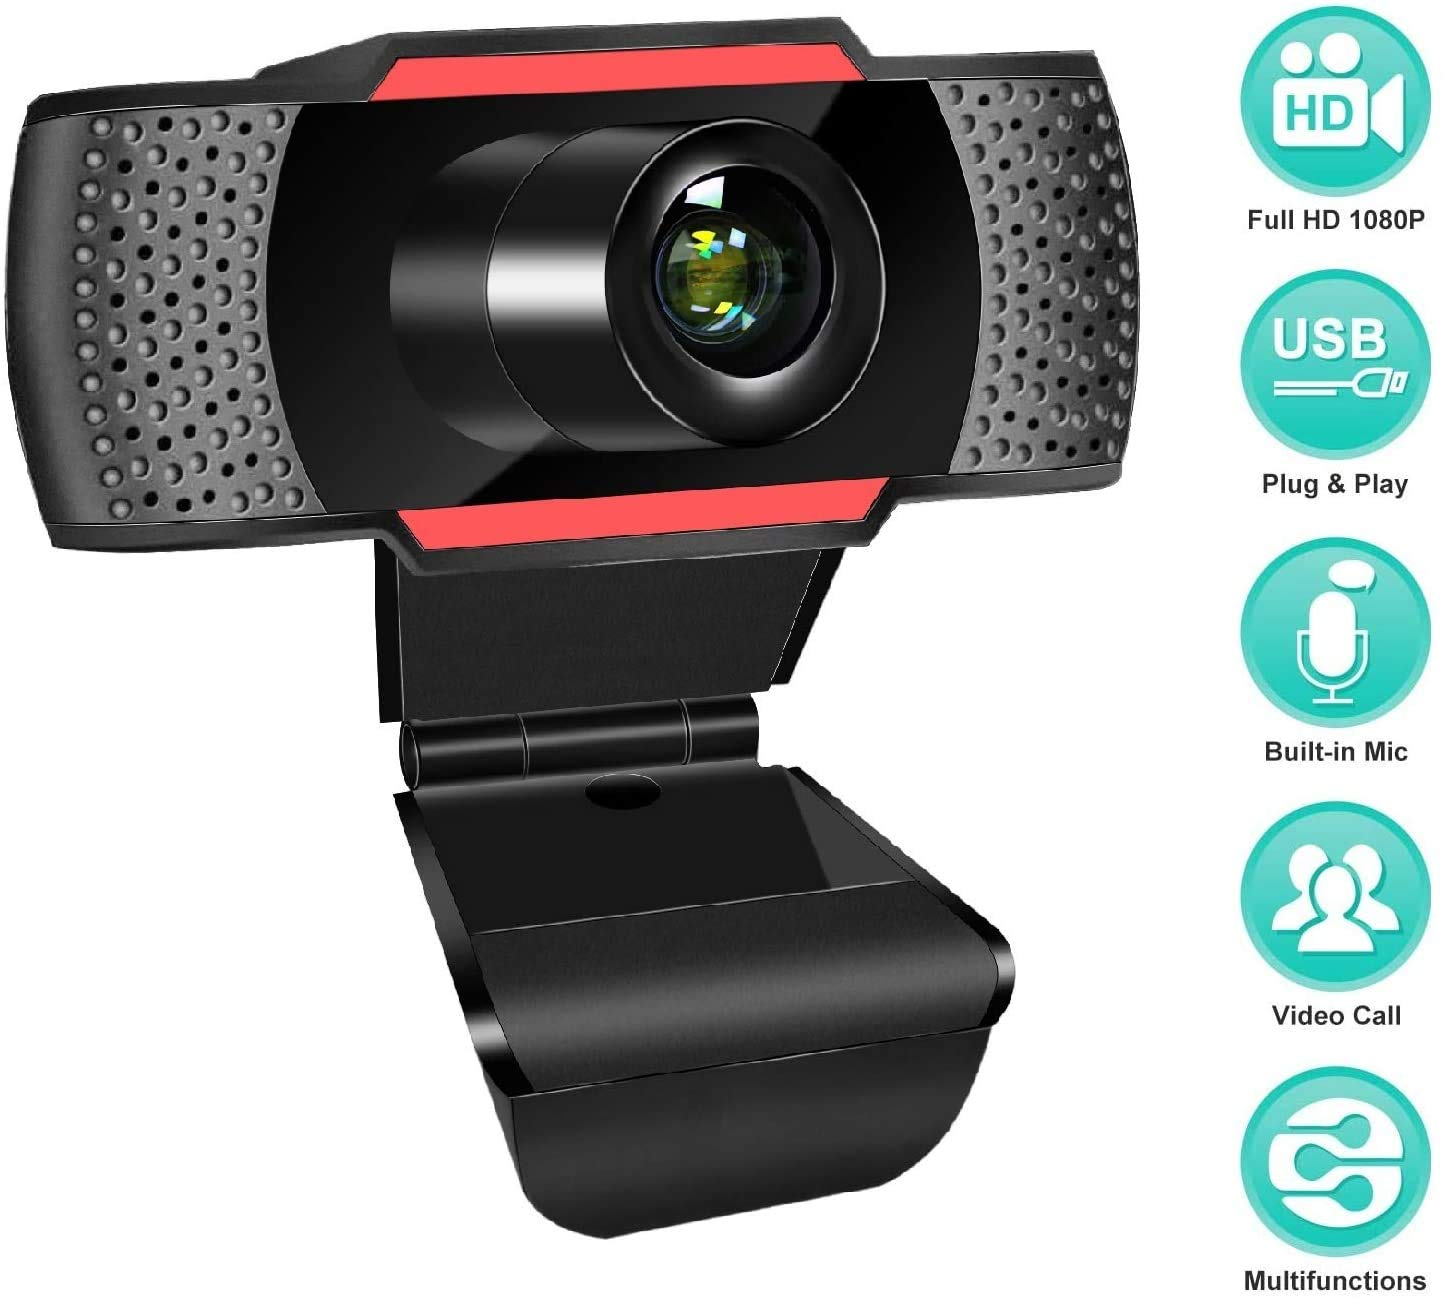 ANWIKE Cámara Web 1080P HD con Micrófono, Webcam de Computadora de Transmisión para Computadora Portátil/Computadora de Escritorio/TV USB, Cámara de PC USB para Video Llamada/Conferencia: Amazon.es: Electrónica